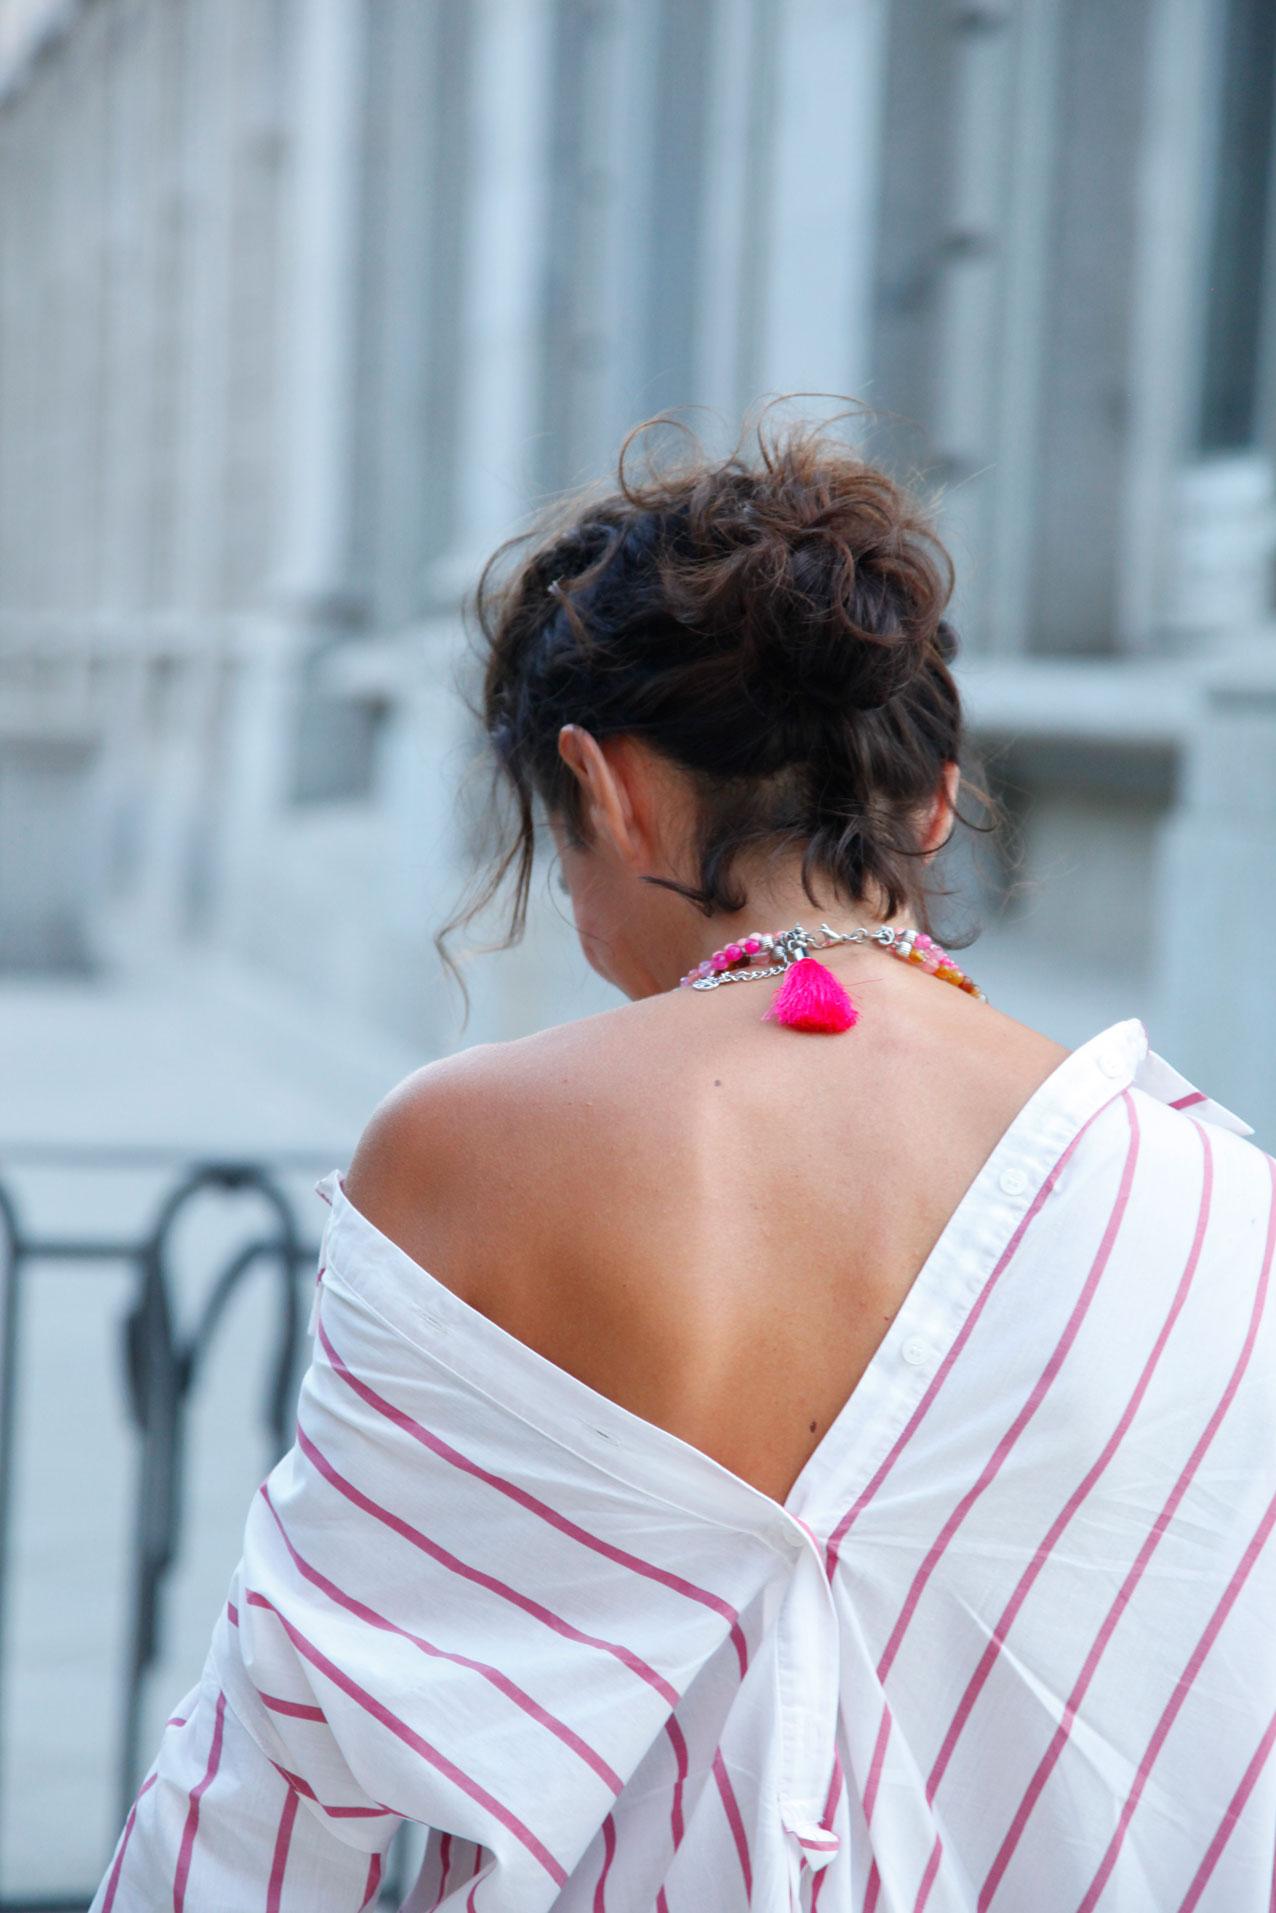 new_shirt-cool_lemonade-tapizado-velvet_platforms-streetstyle3